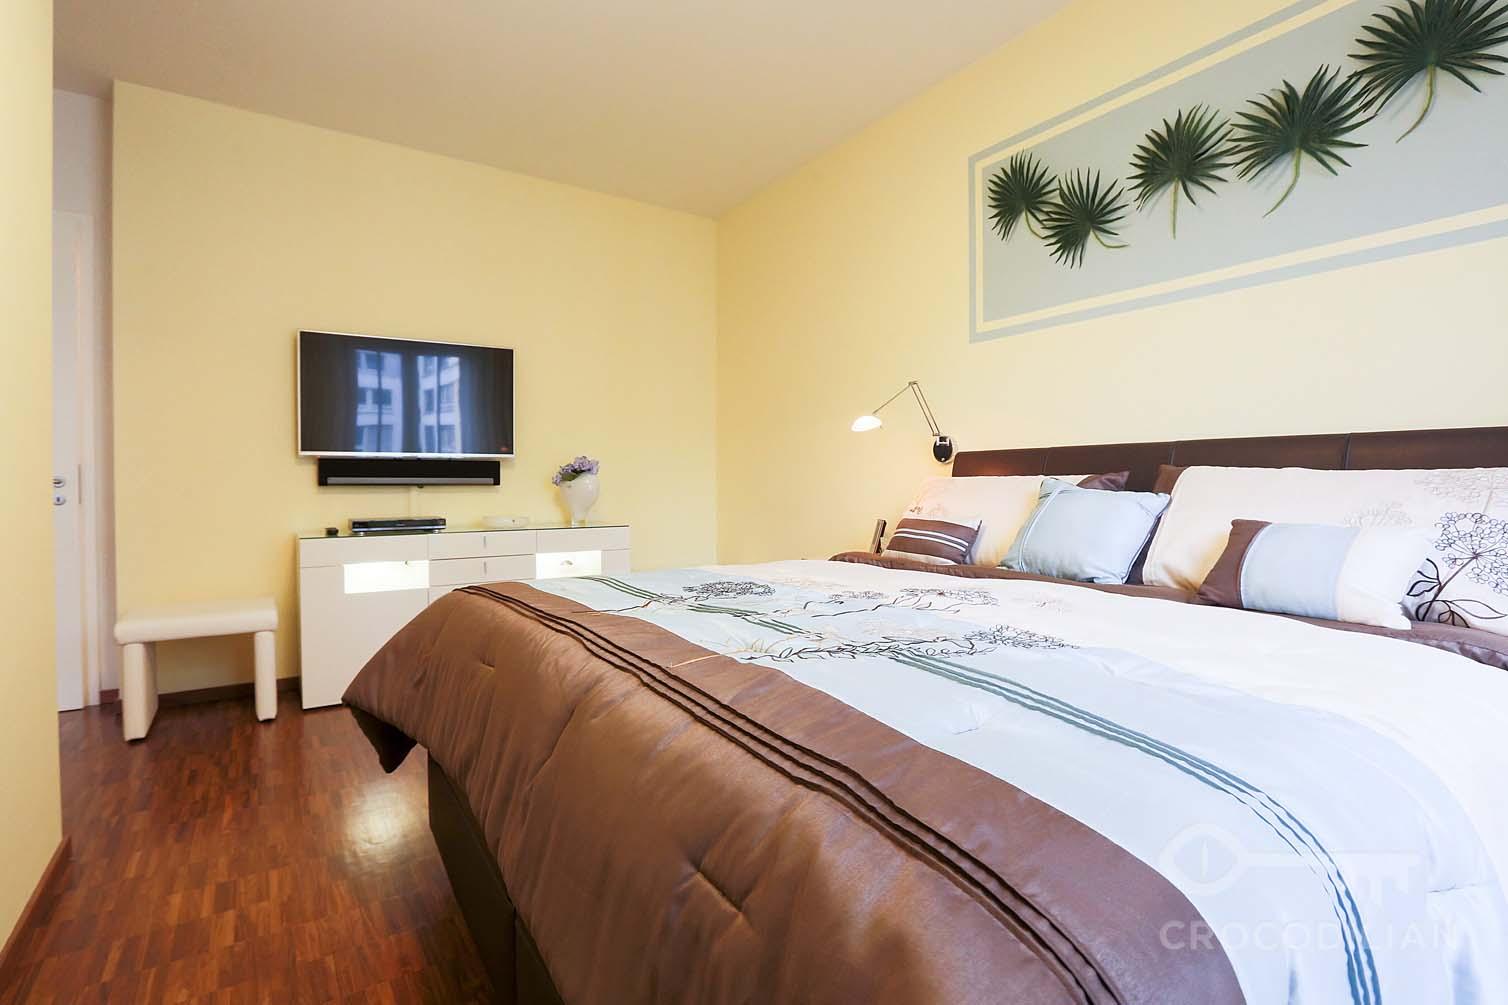 Luxury 2-Room Apartment with Balcony, Underground Parking ...